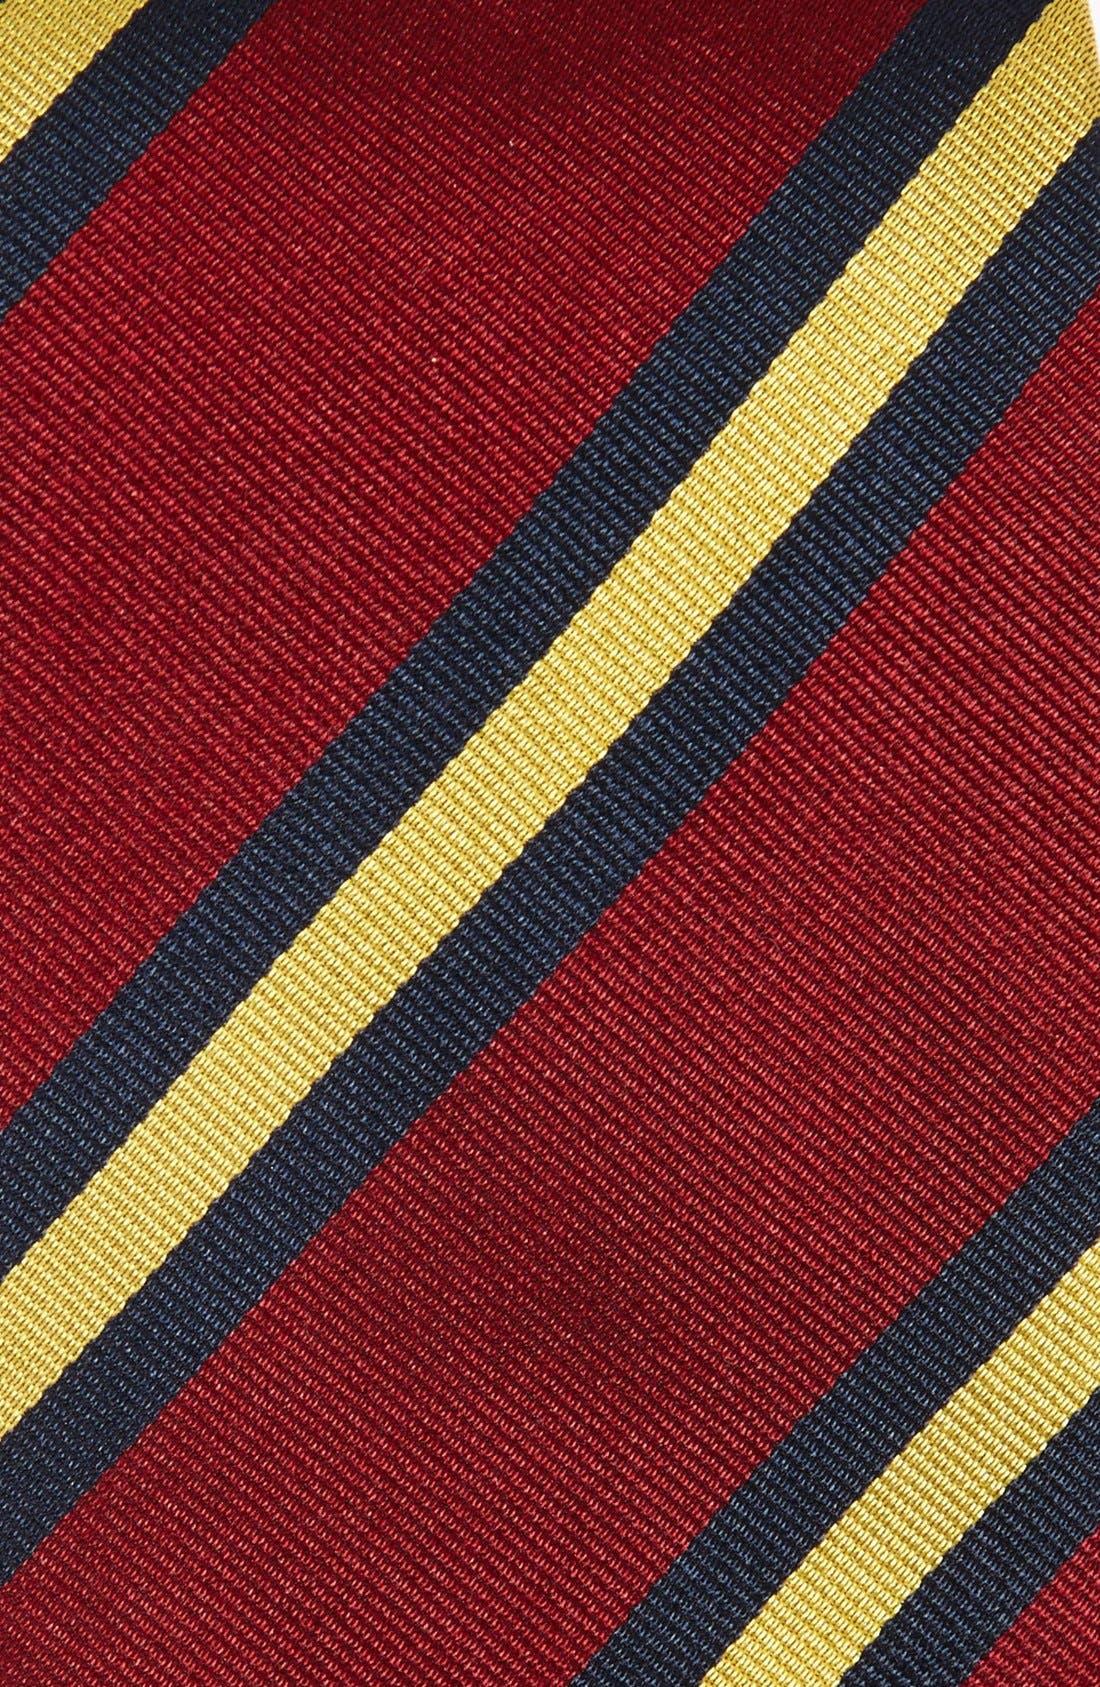 StripeSilk Tie,                             Alternate thumbnail 2, color,                             930